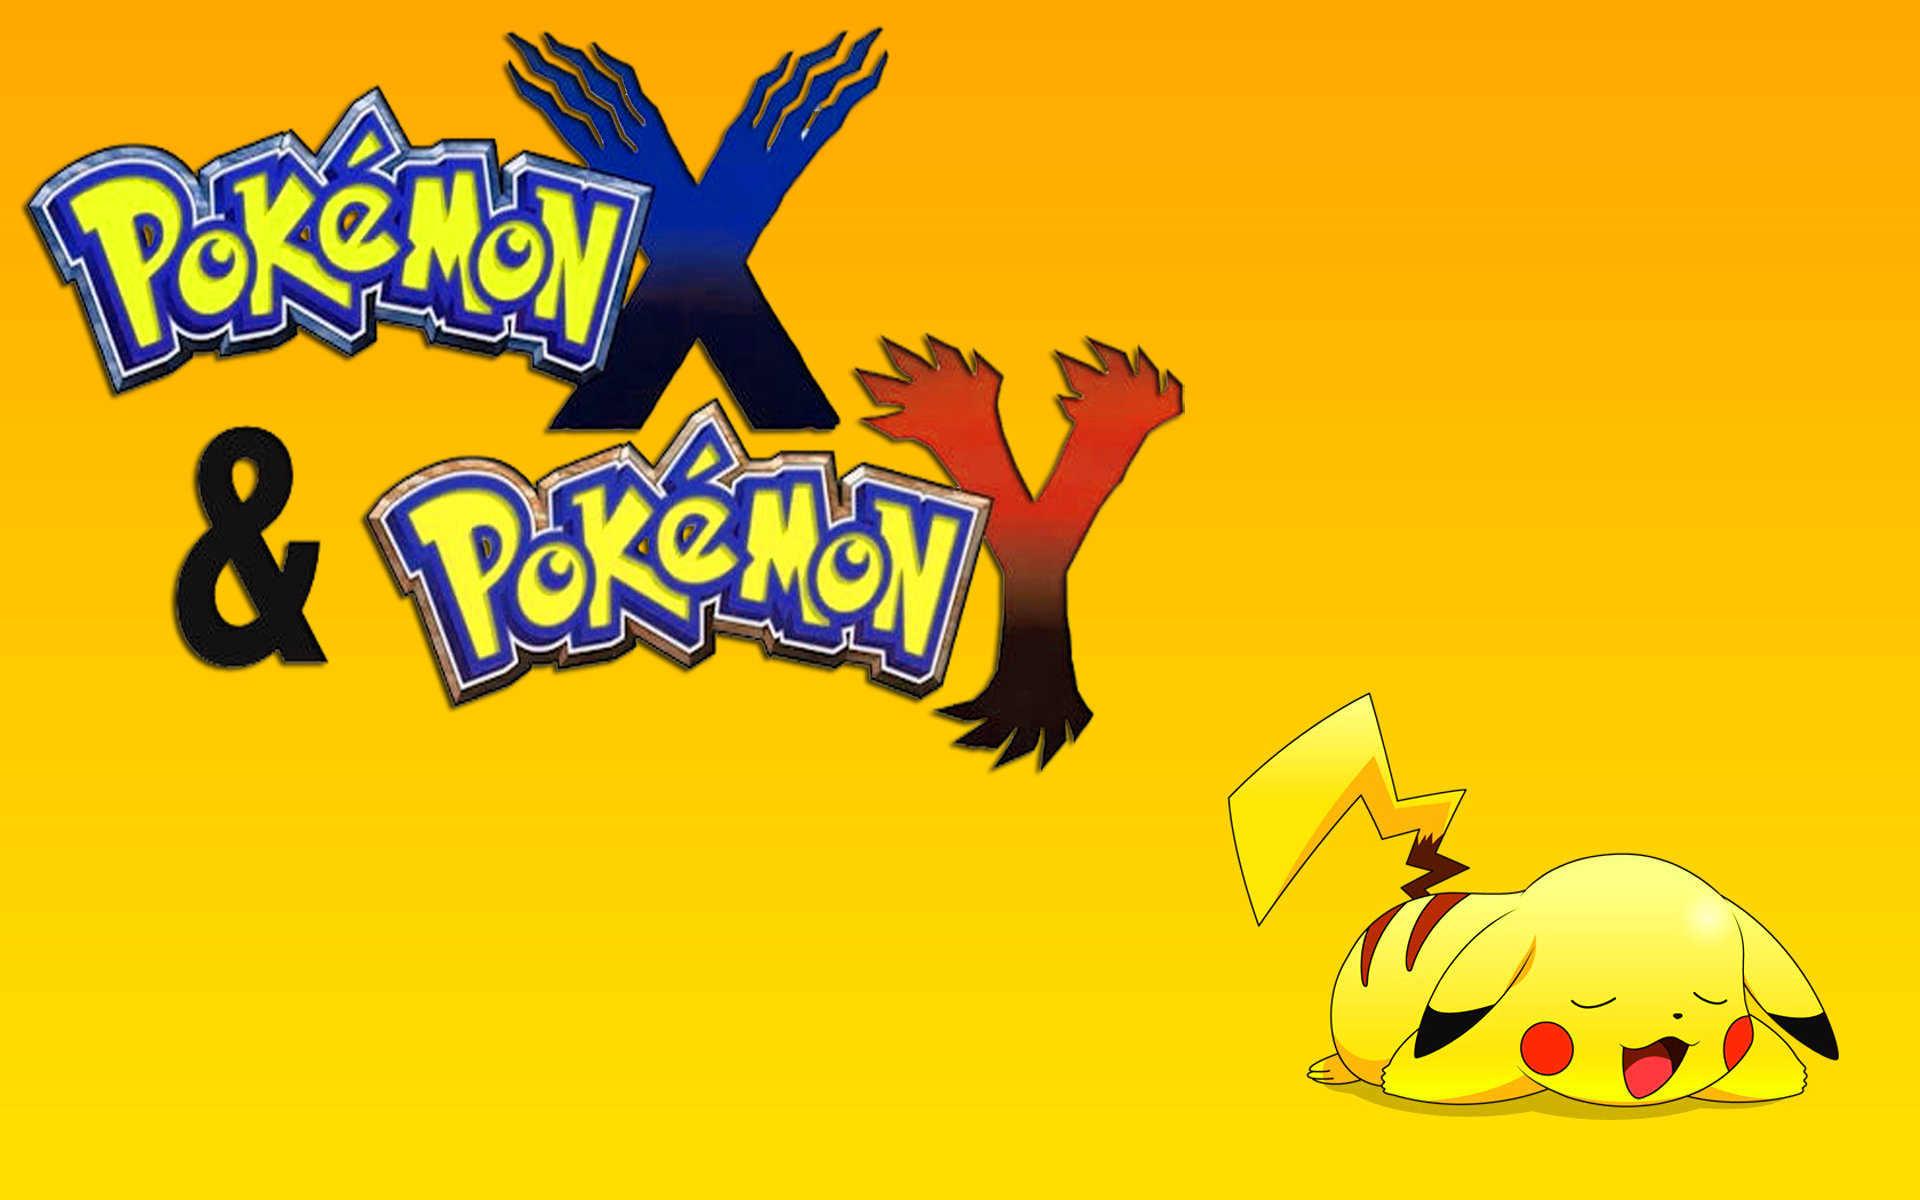 Pokemon X/Y sales through the roof